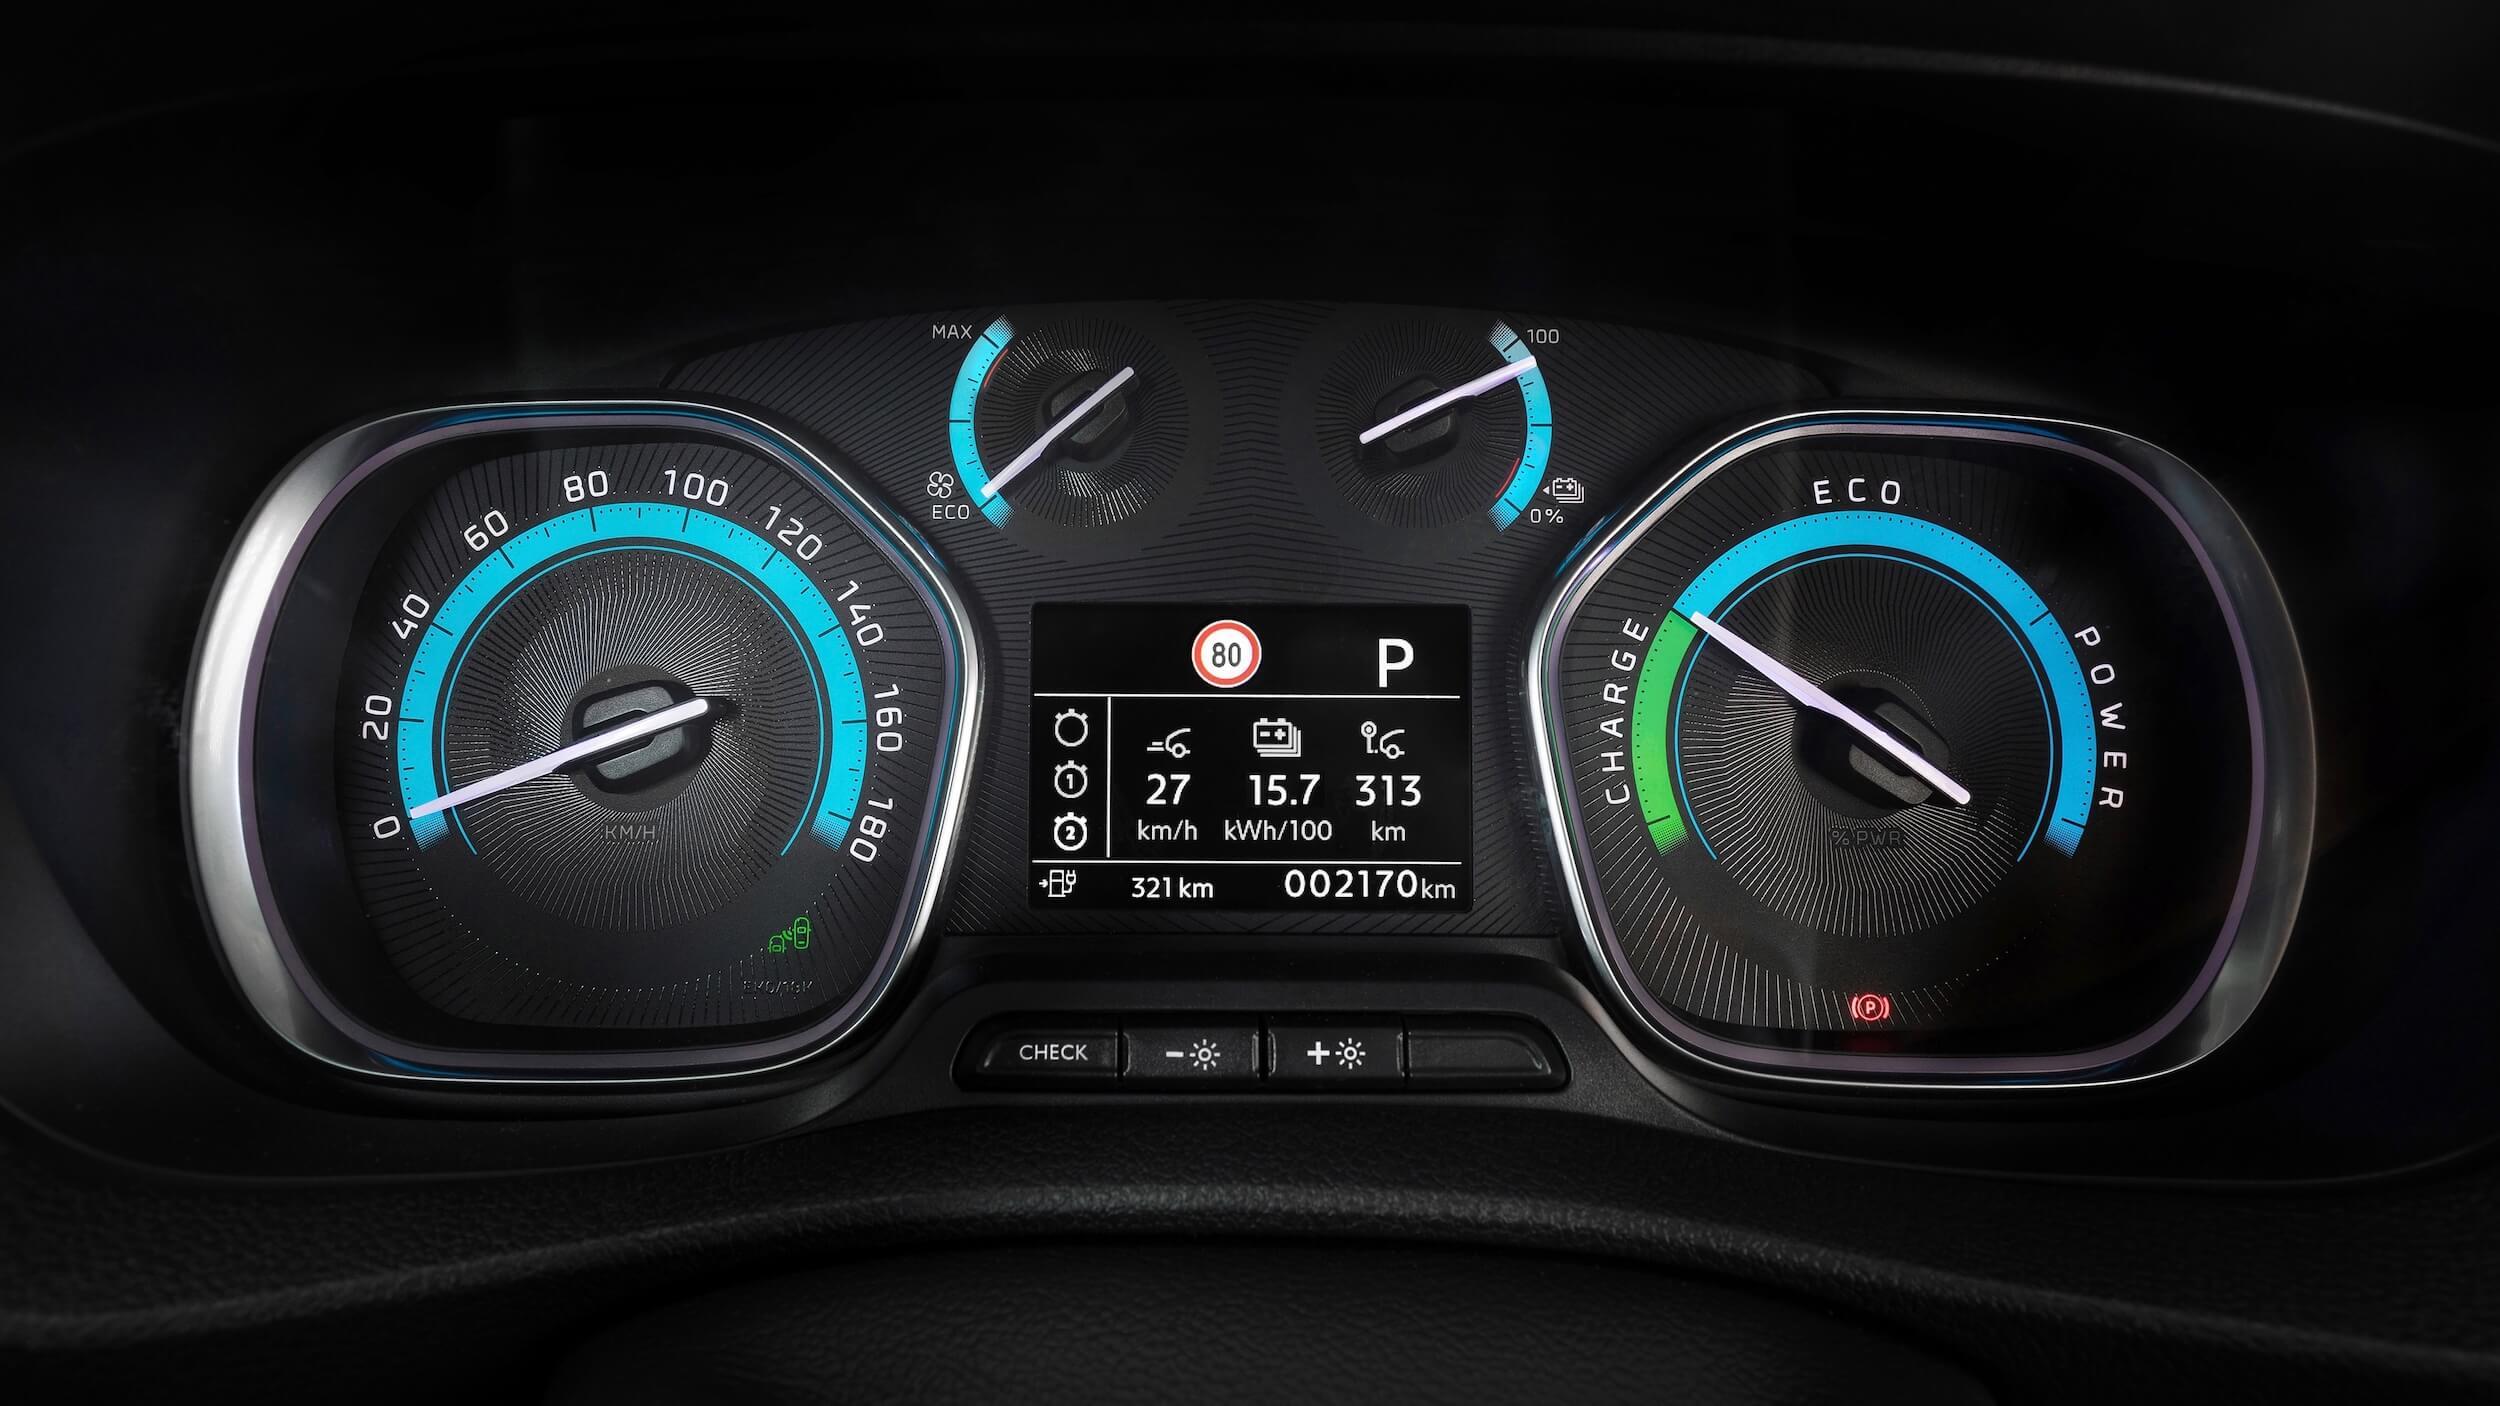 Opel Vivaro e Combi tellers